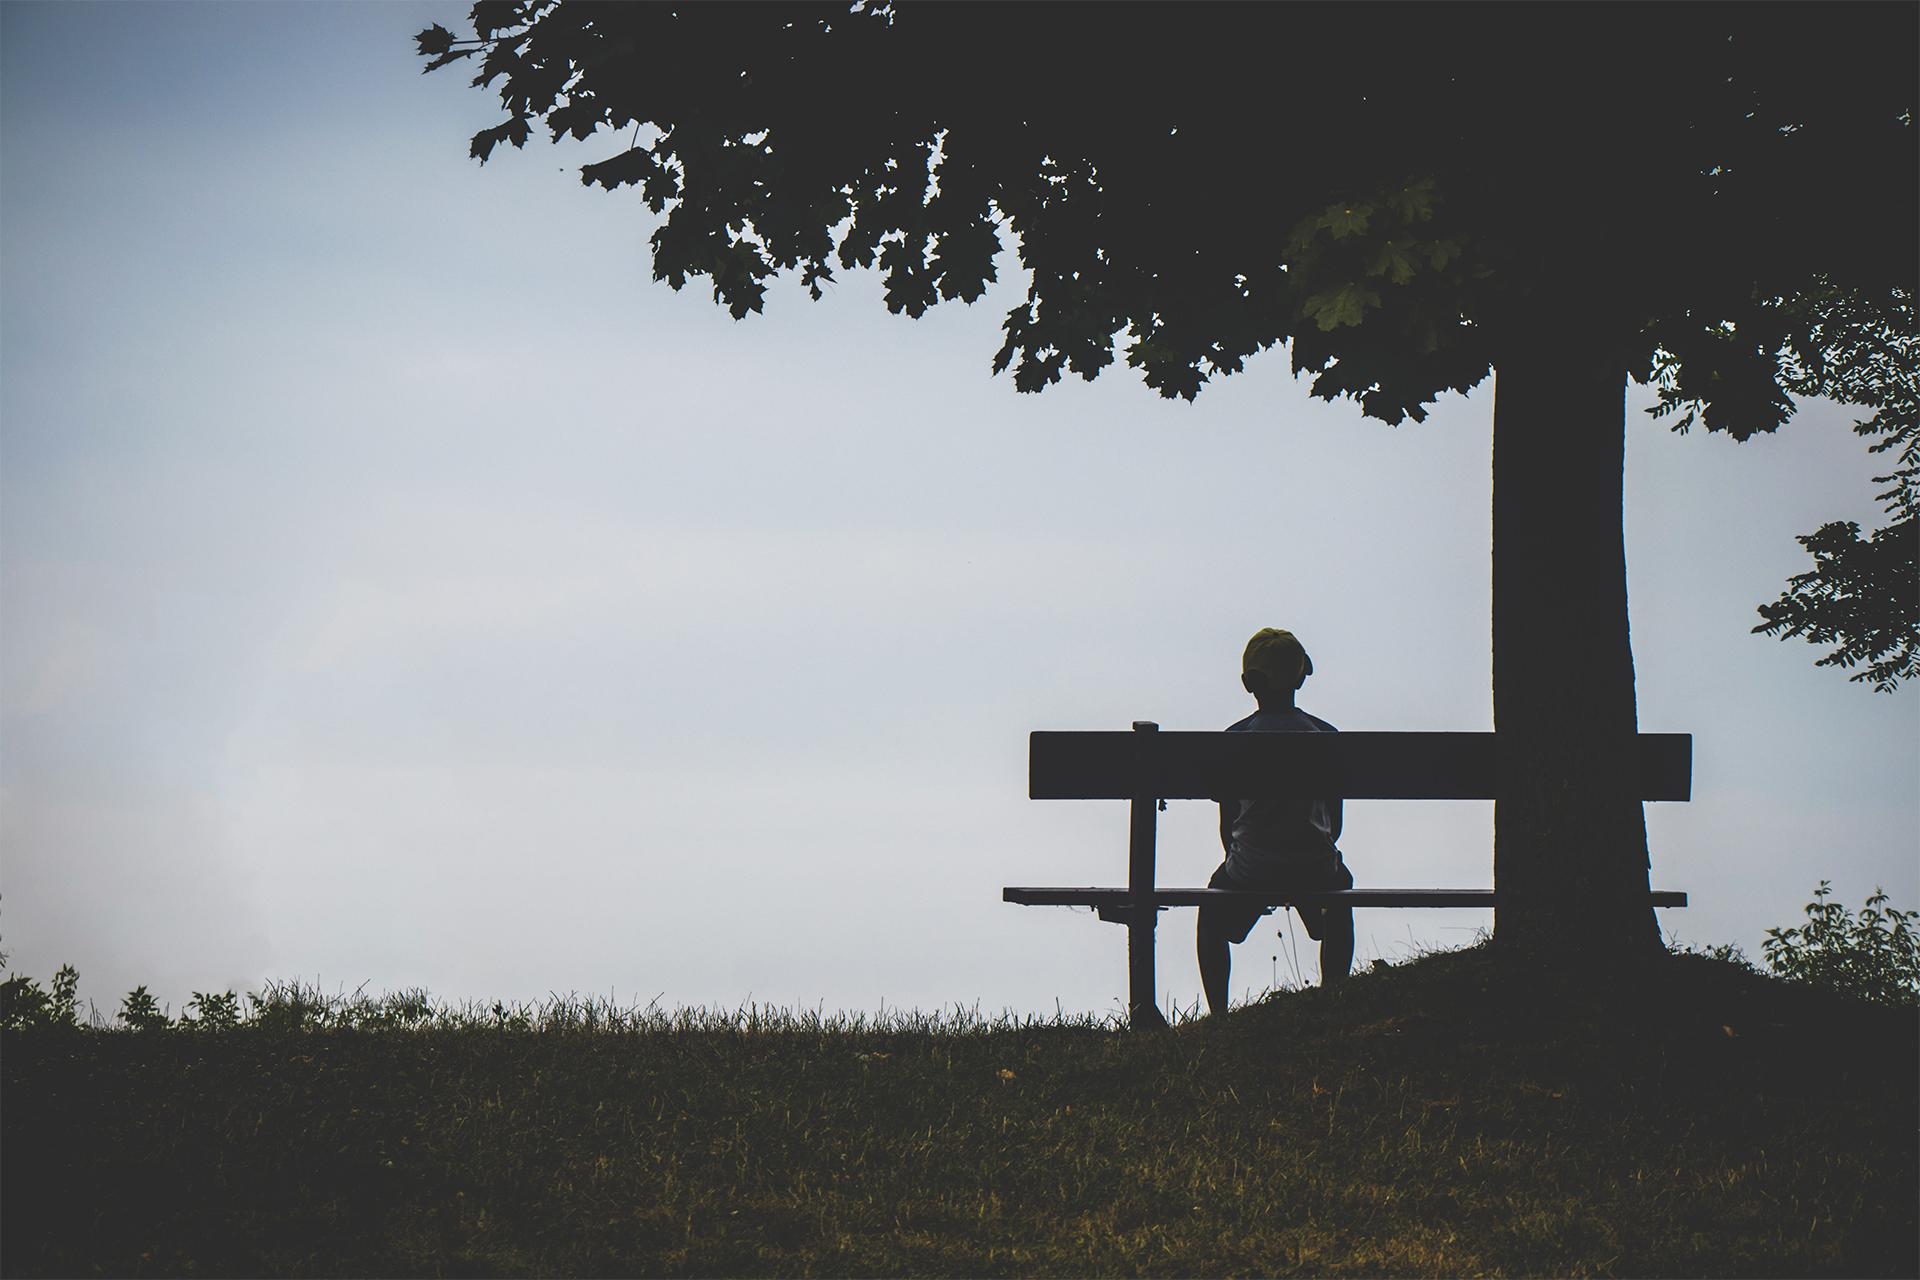 sitting on park bench